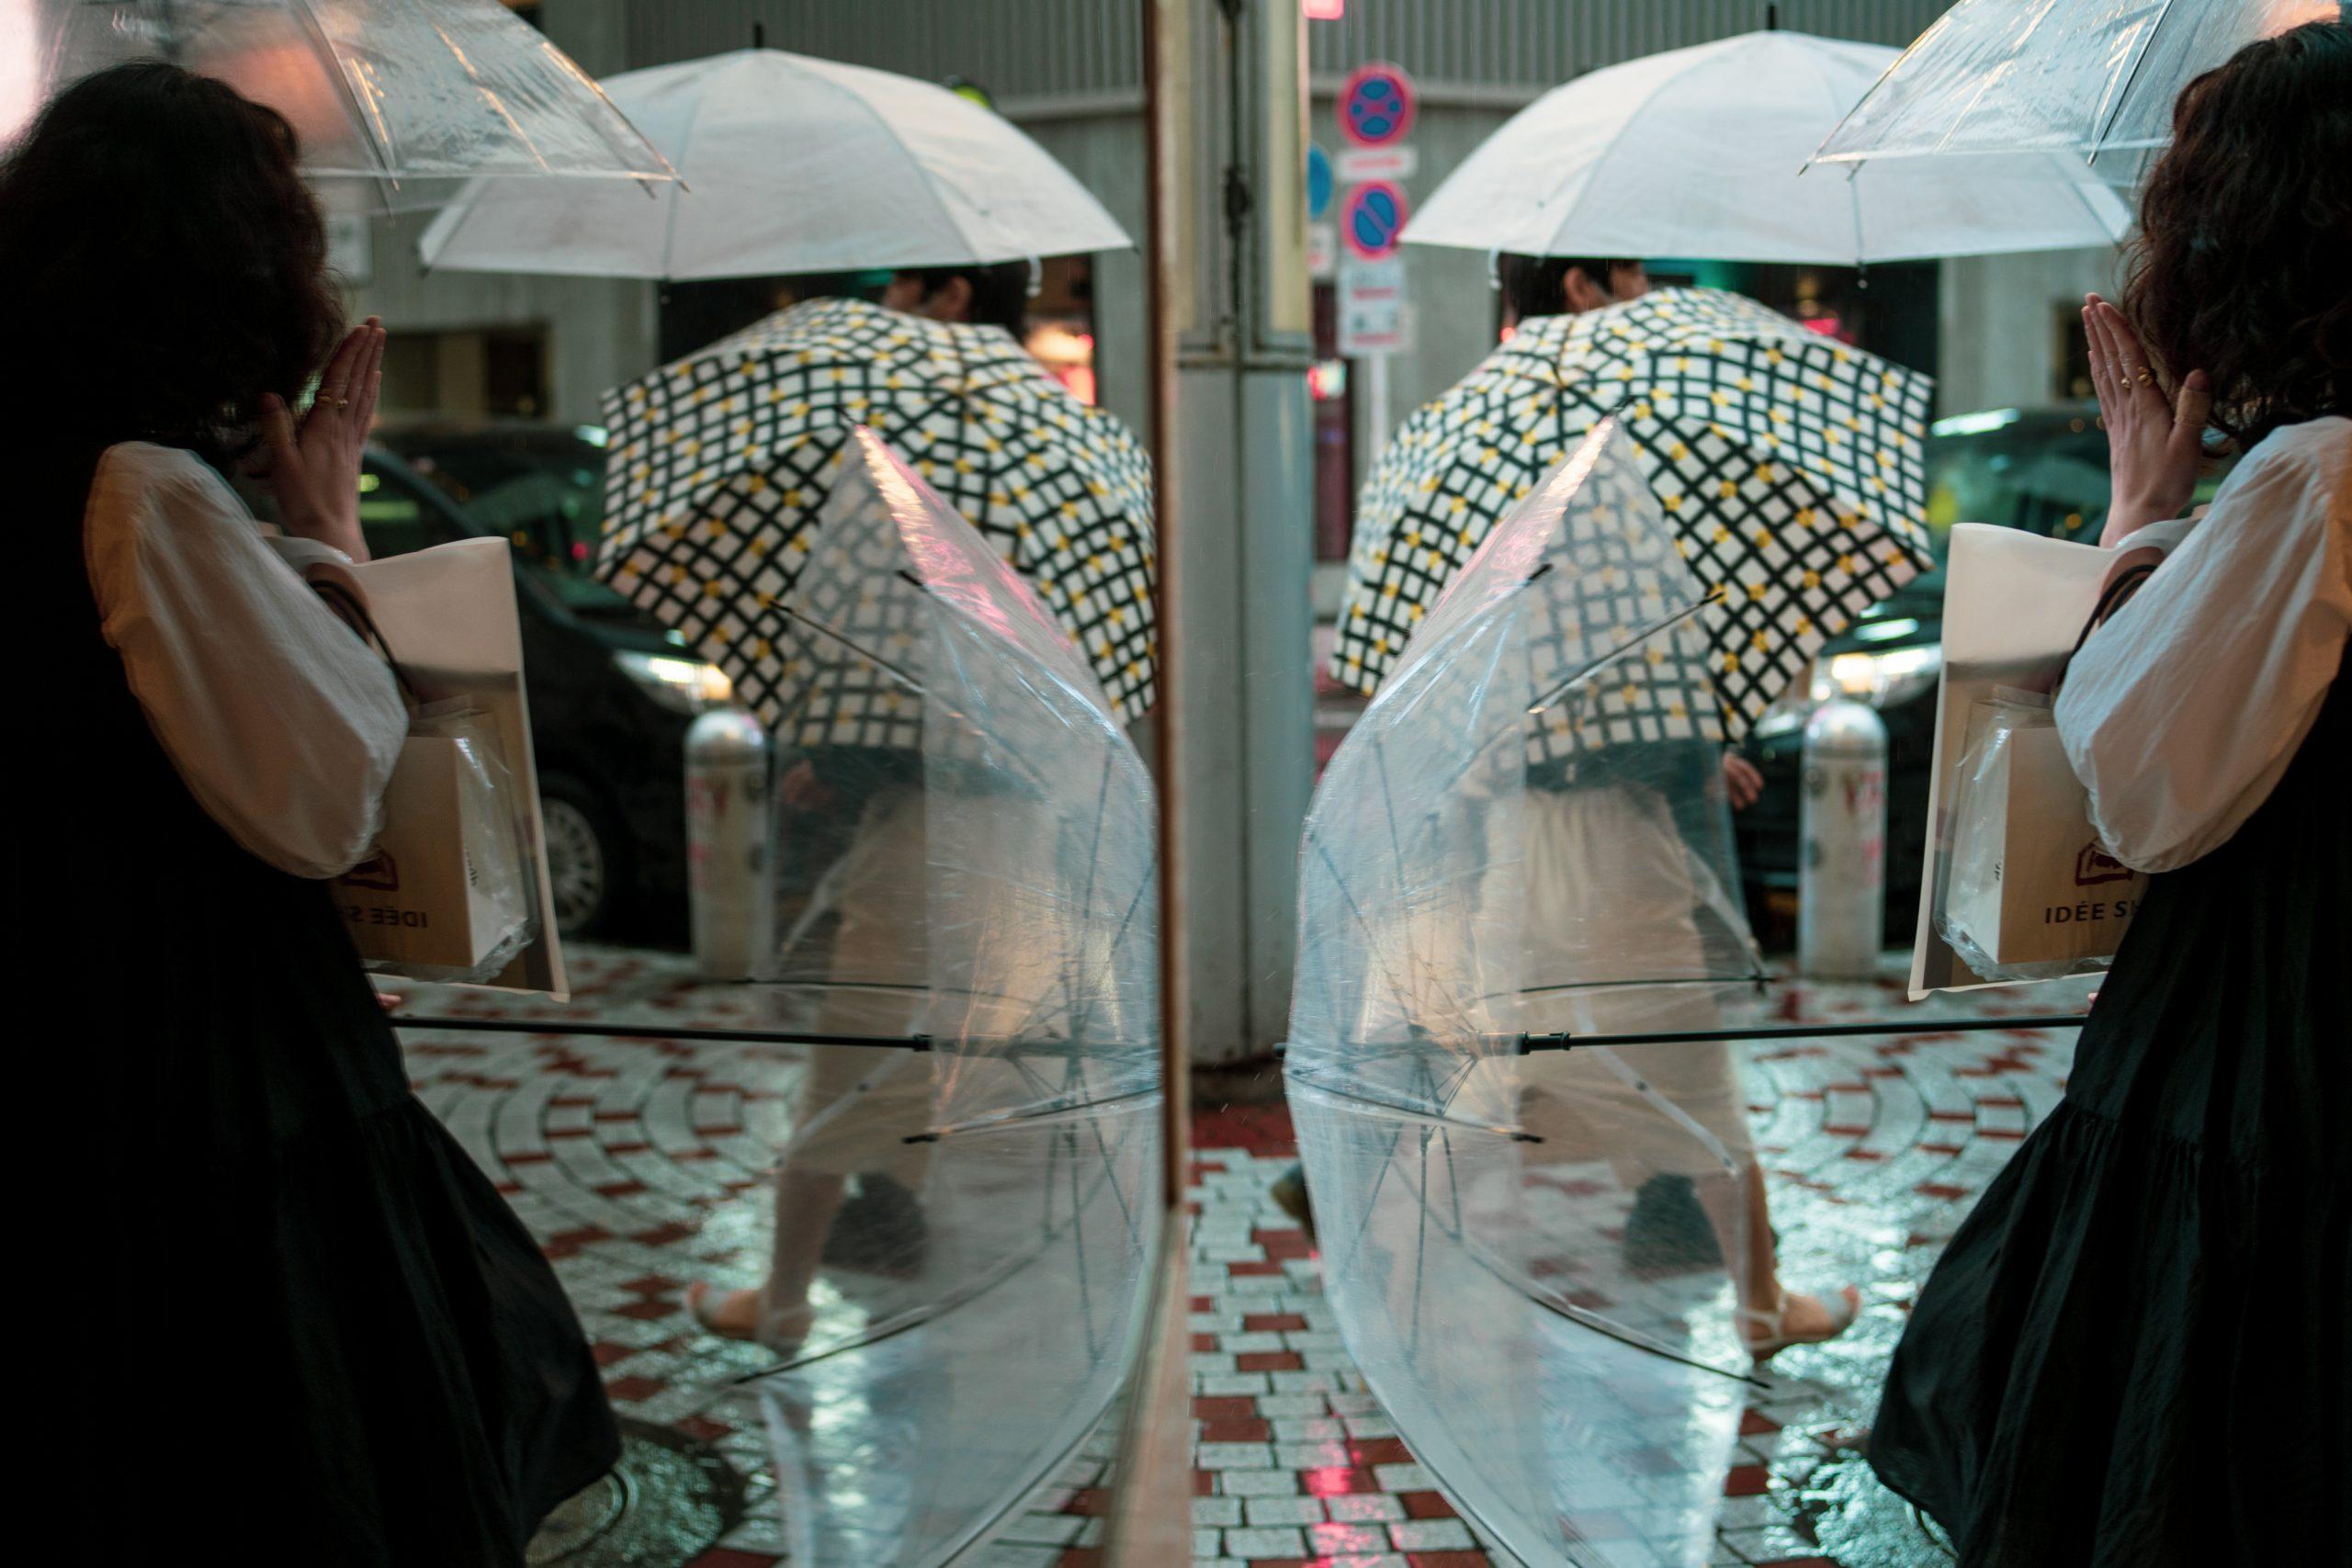 【Voigtlander】雨の日はスナップ日和。NOKTON 40mm F1.2 Aspherical SE